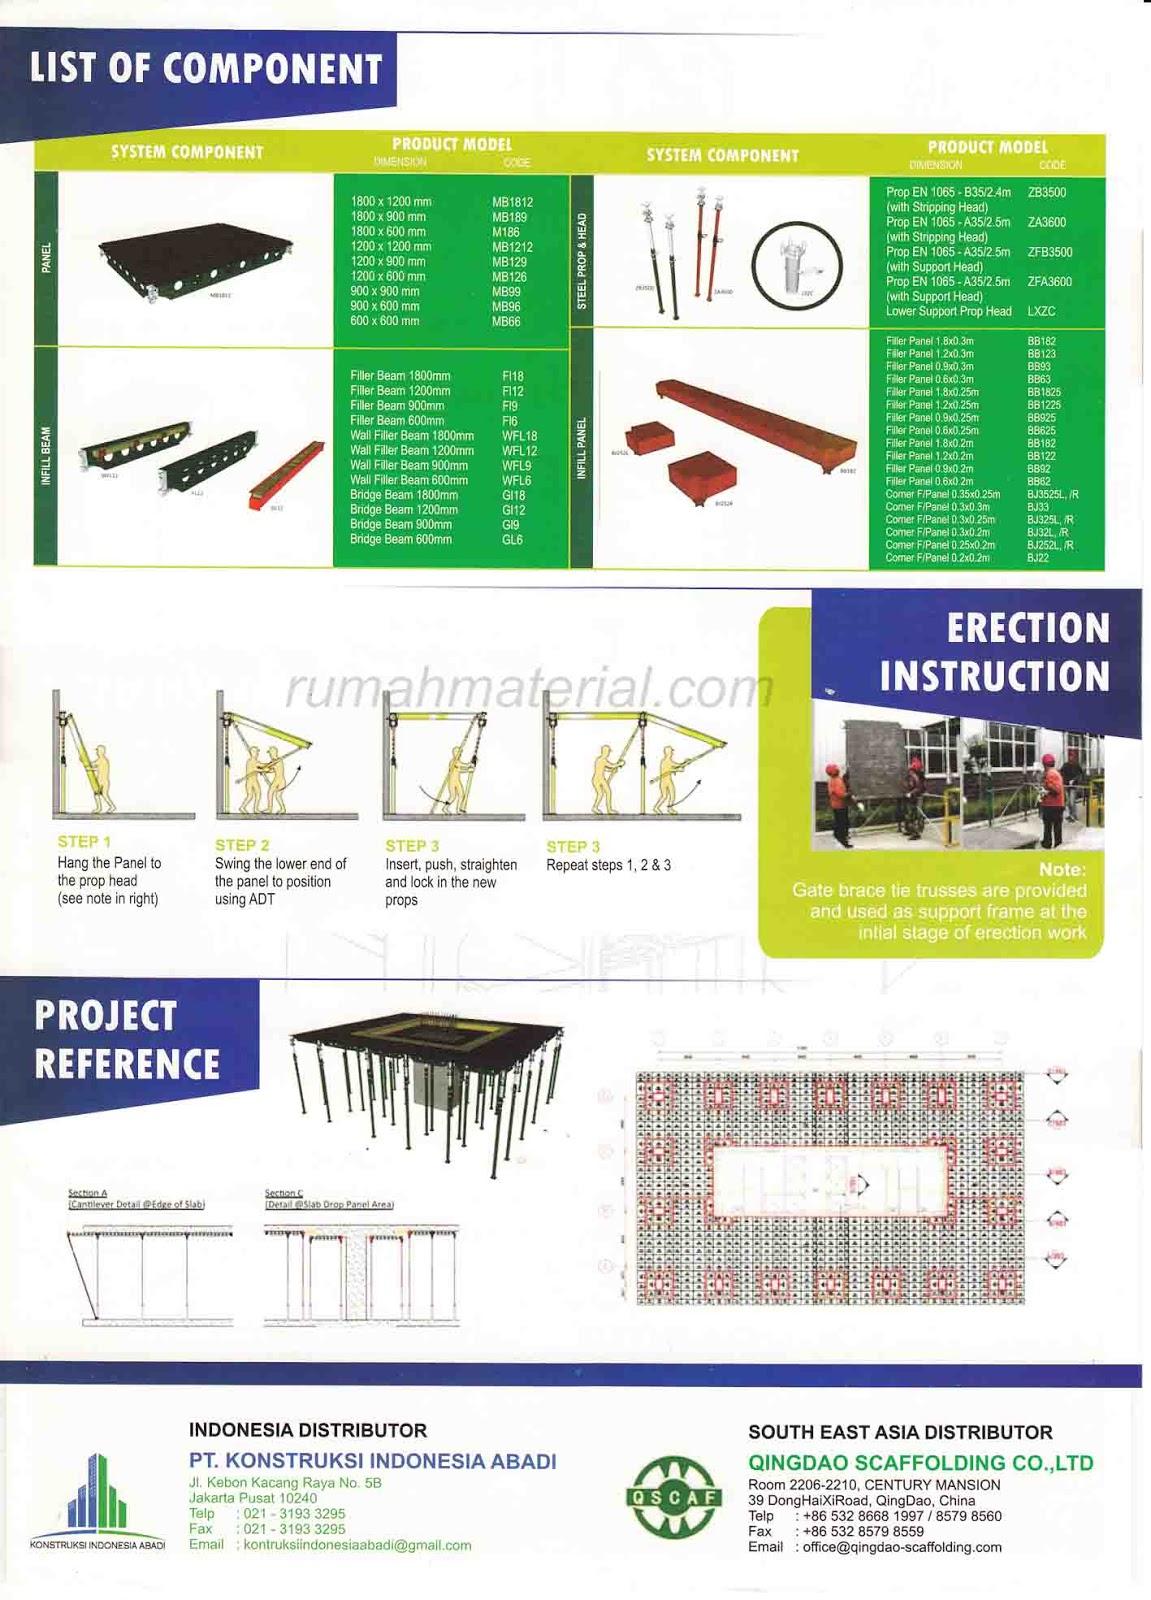 Komponen dan Cara Perakitan Bekisting Beton Green Formwork